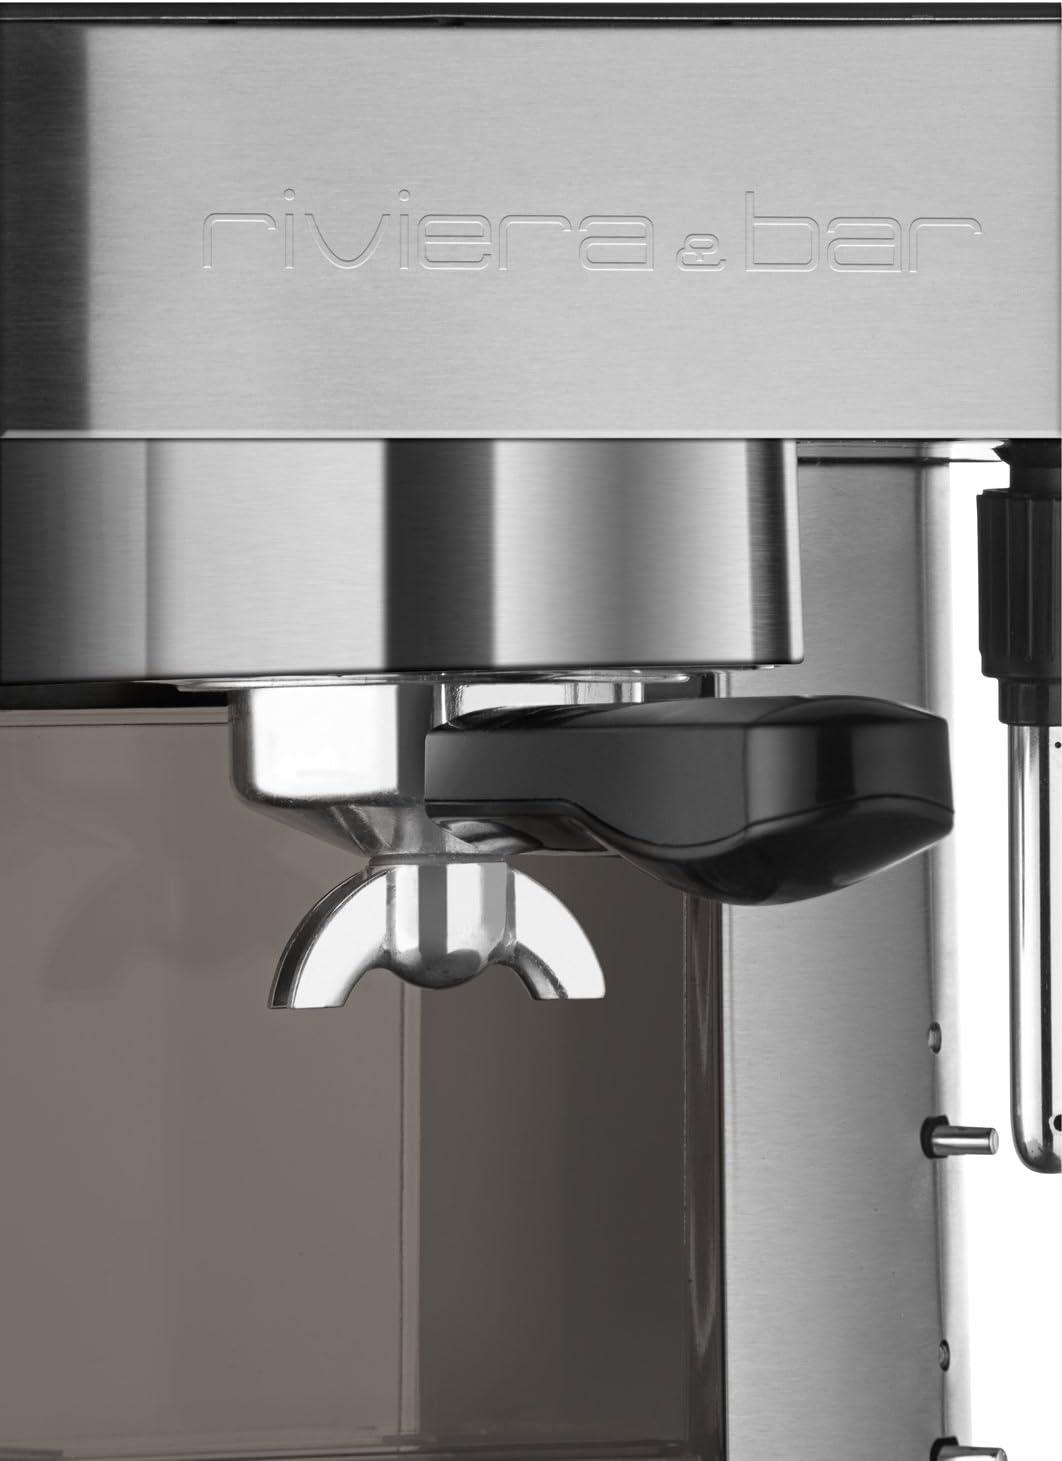 Riviera & Bar CE342A - Cafetera de espresso manual, color gris ...